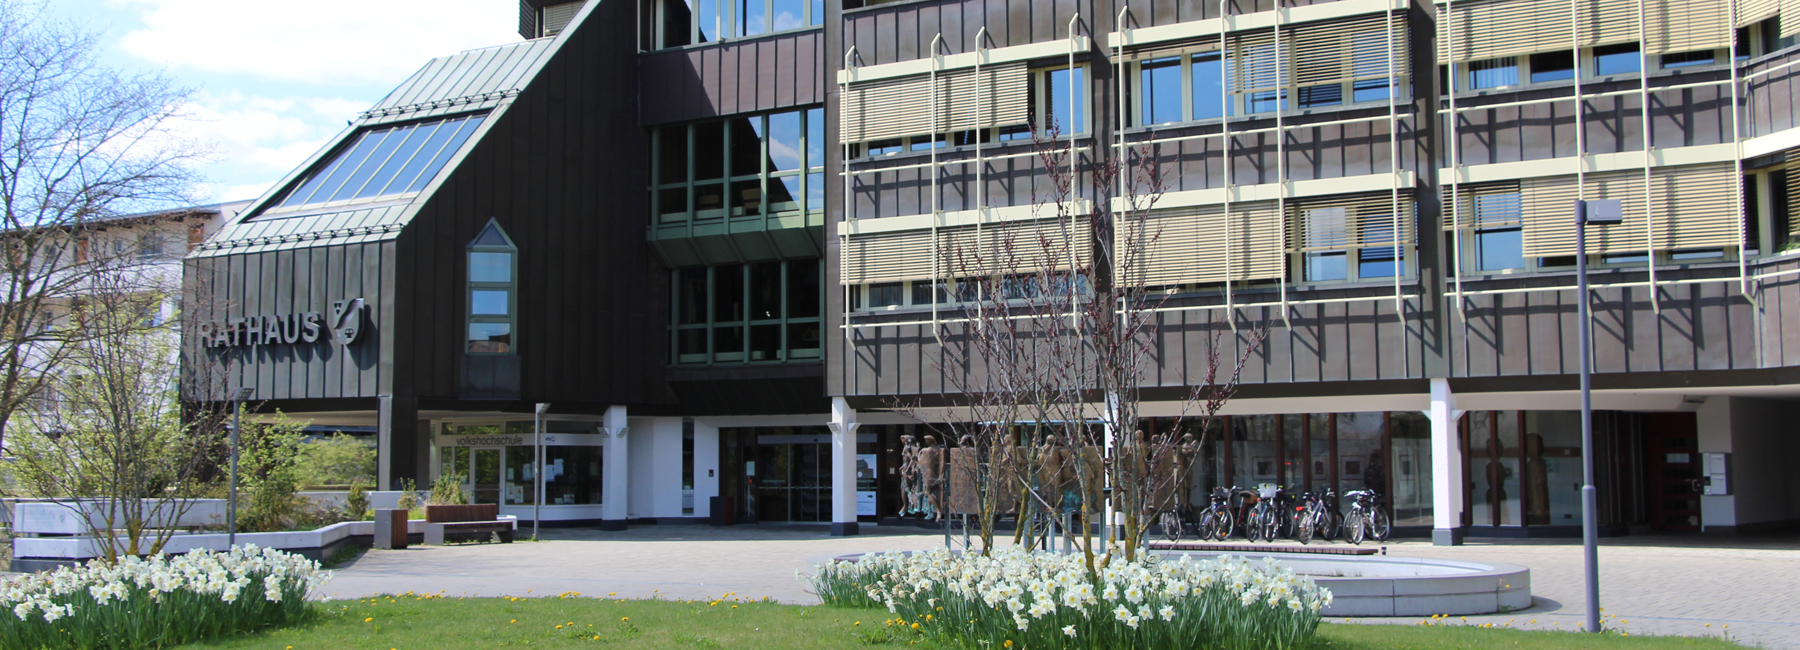 Stadt Mössingen beauftragt Dr. Malcher